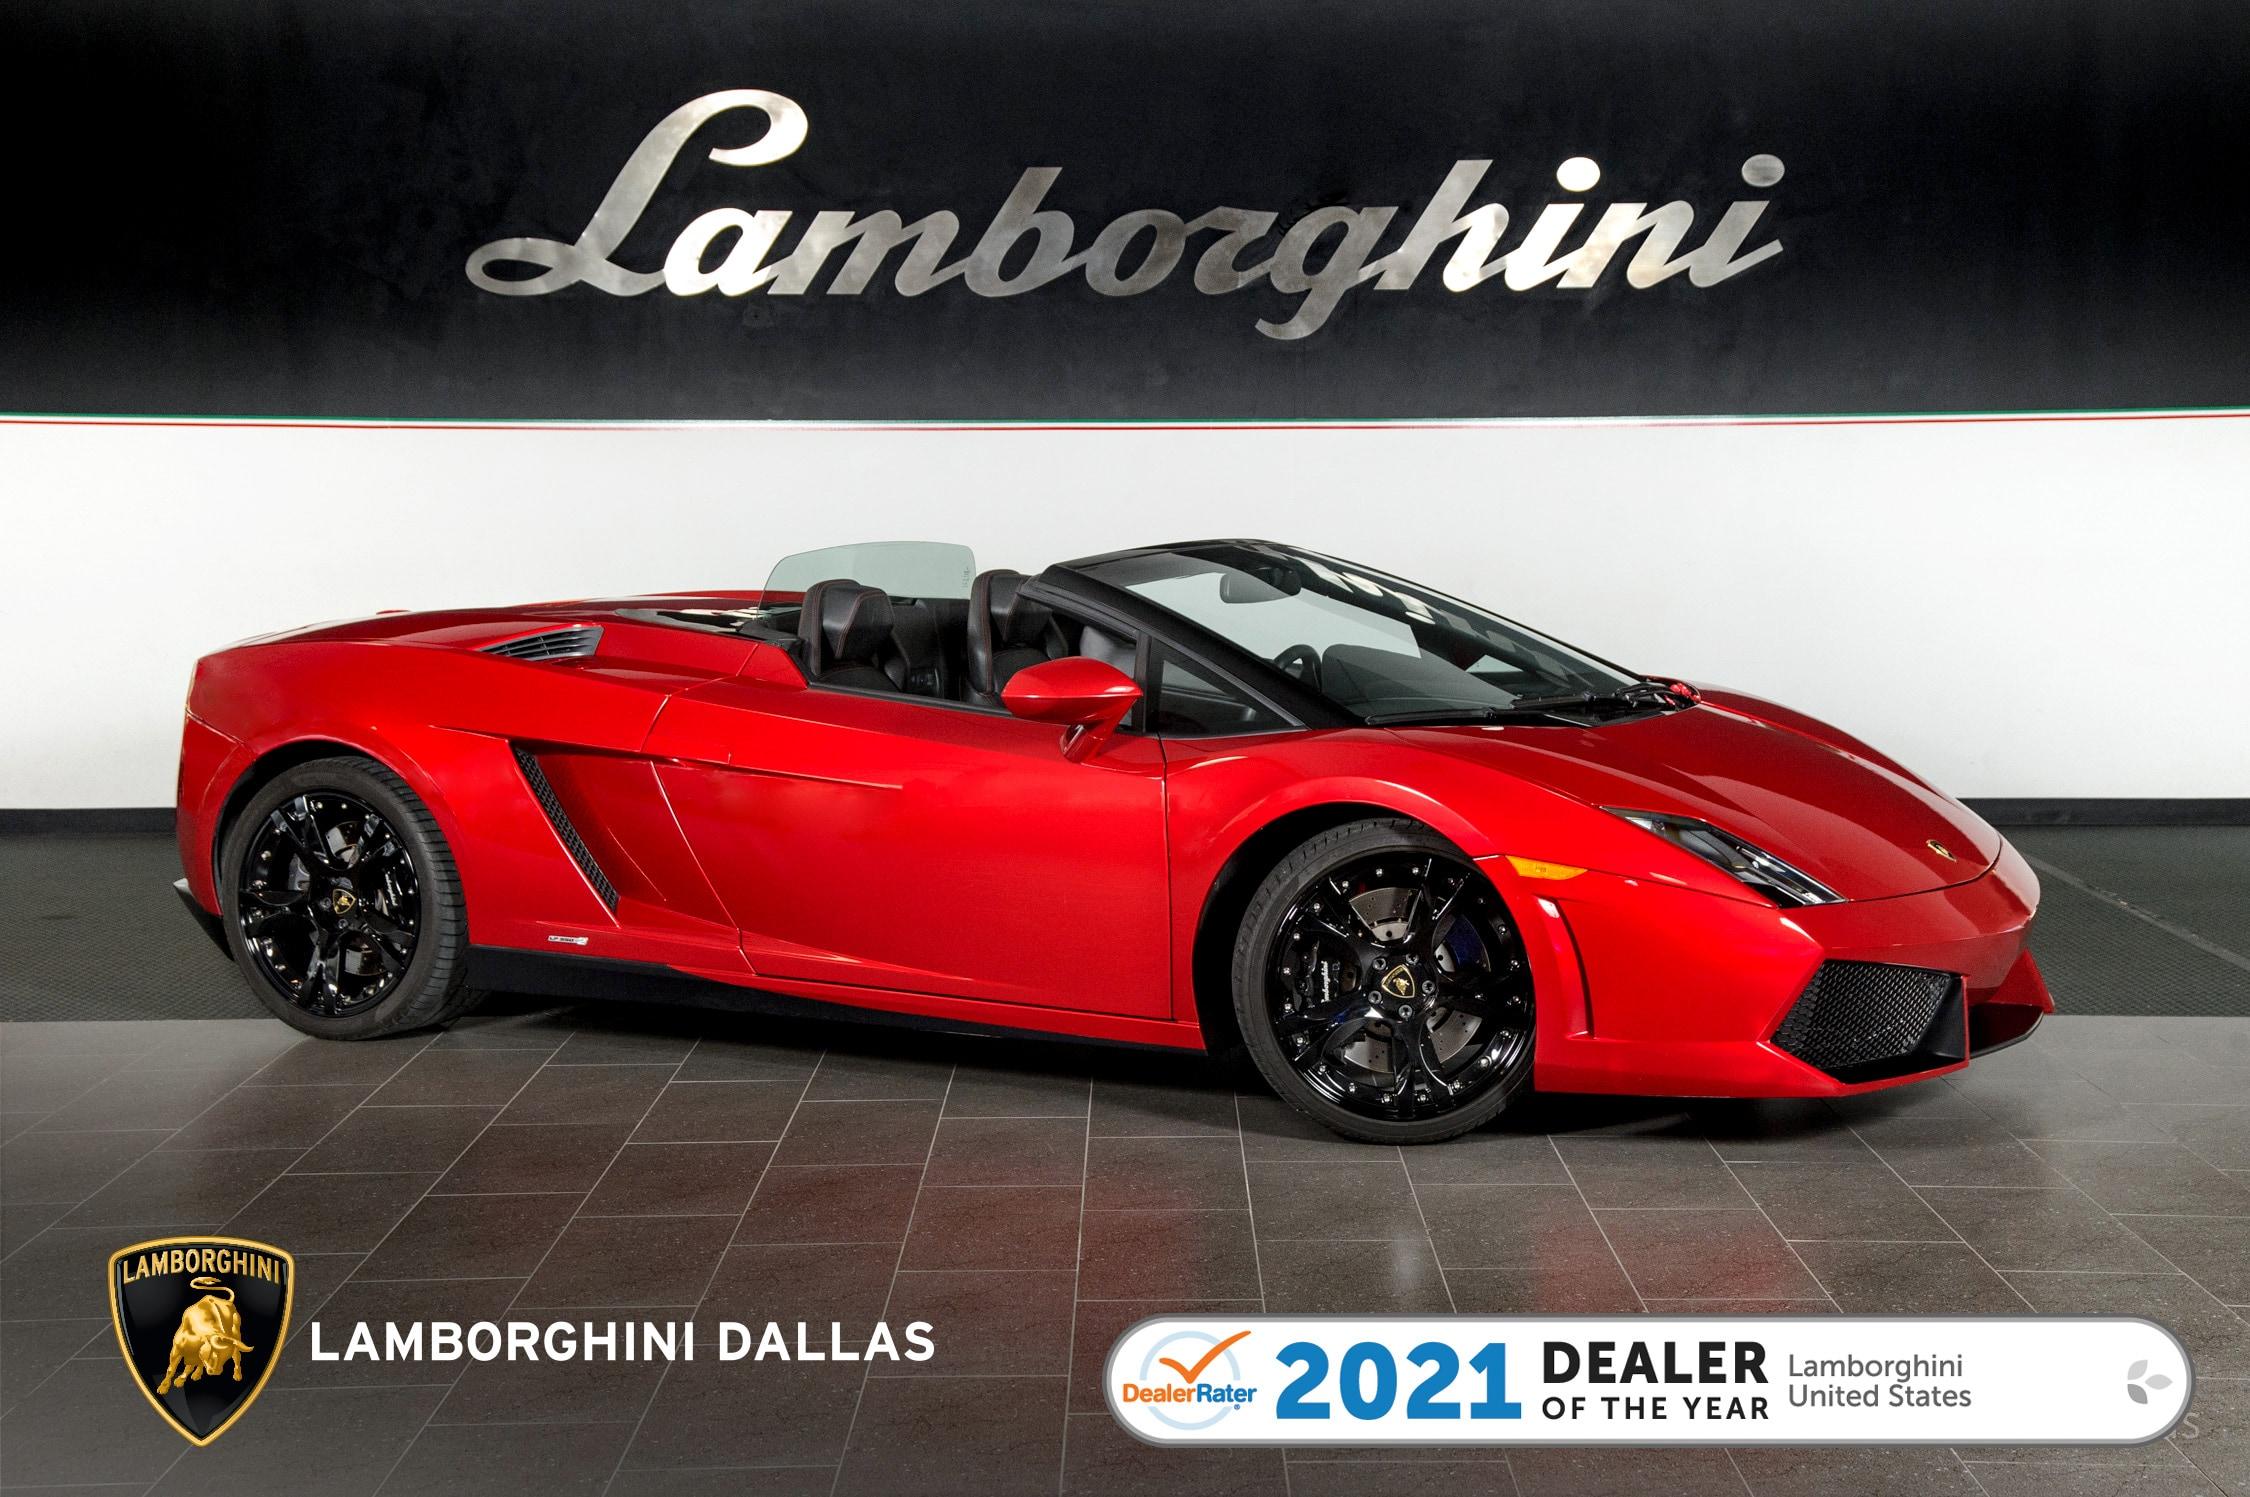 used 2013 Lamborghini Gallardo LP550-2 car, priced at $139,999